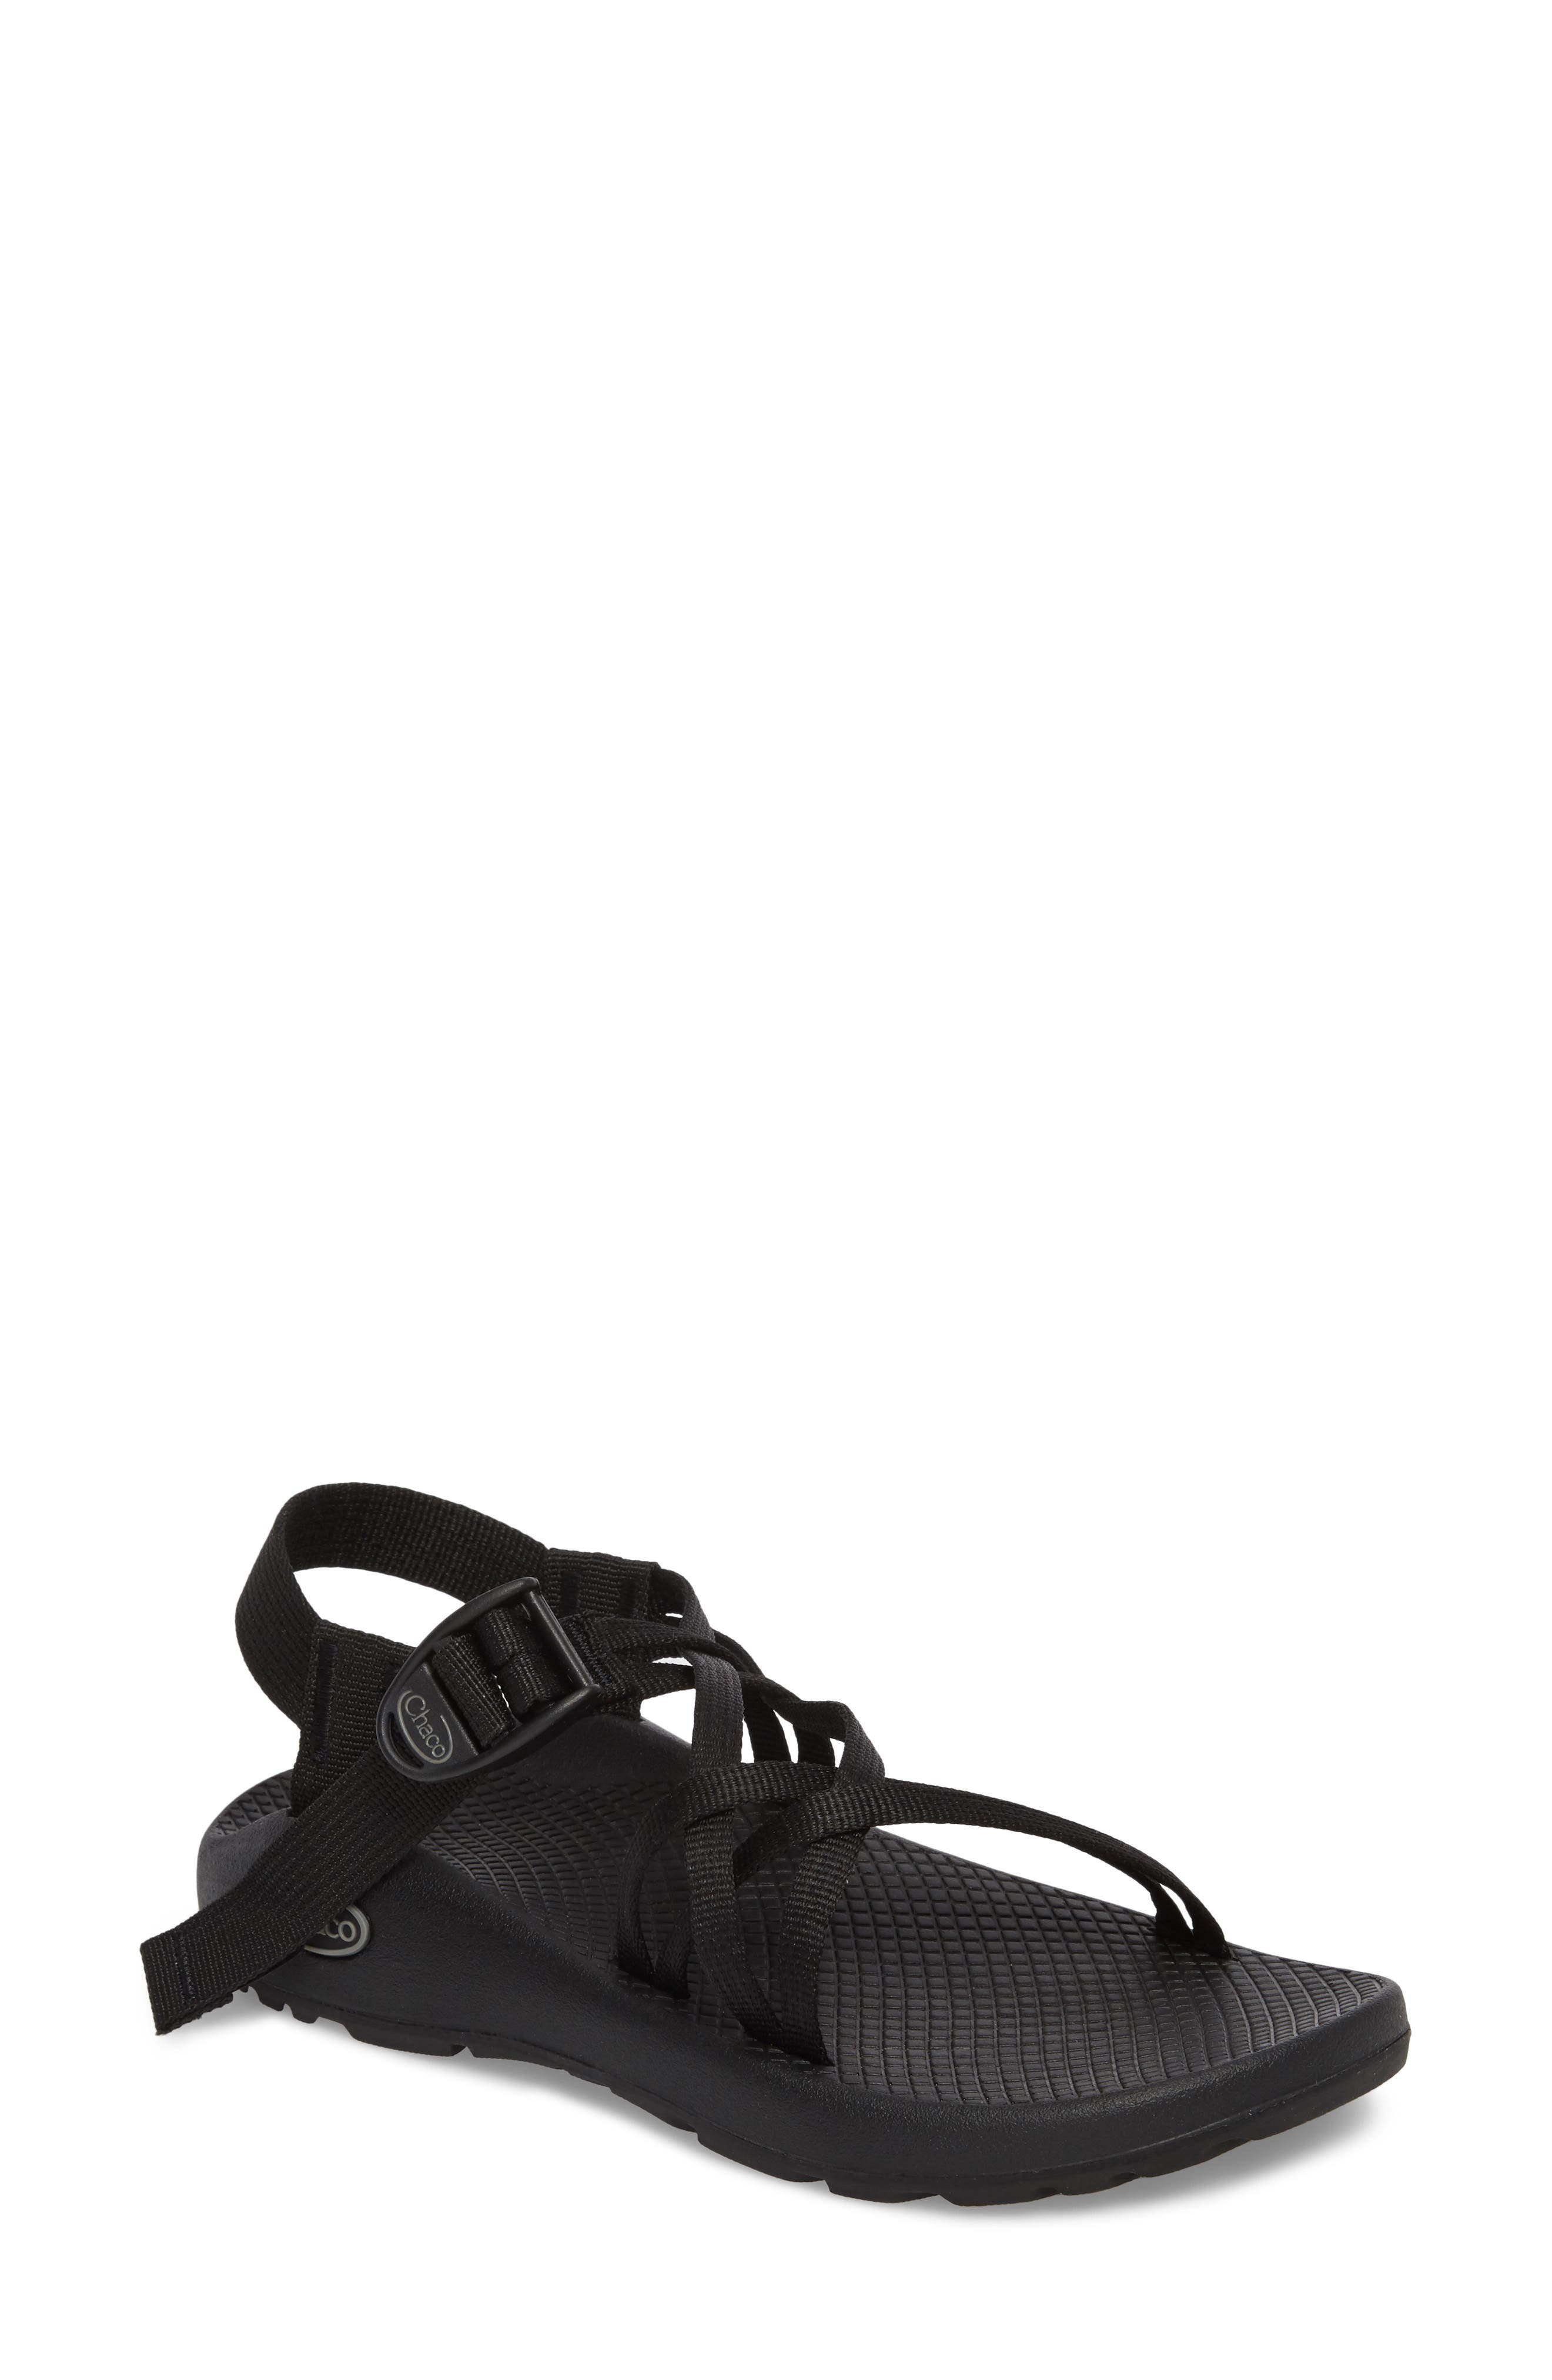 Main Image - Chaco ZX1 Classic Sport Sandal (Women)